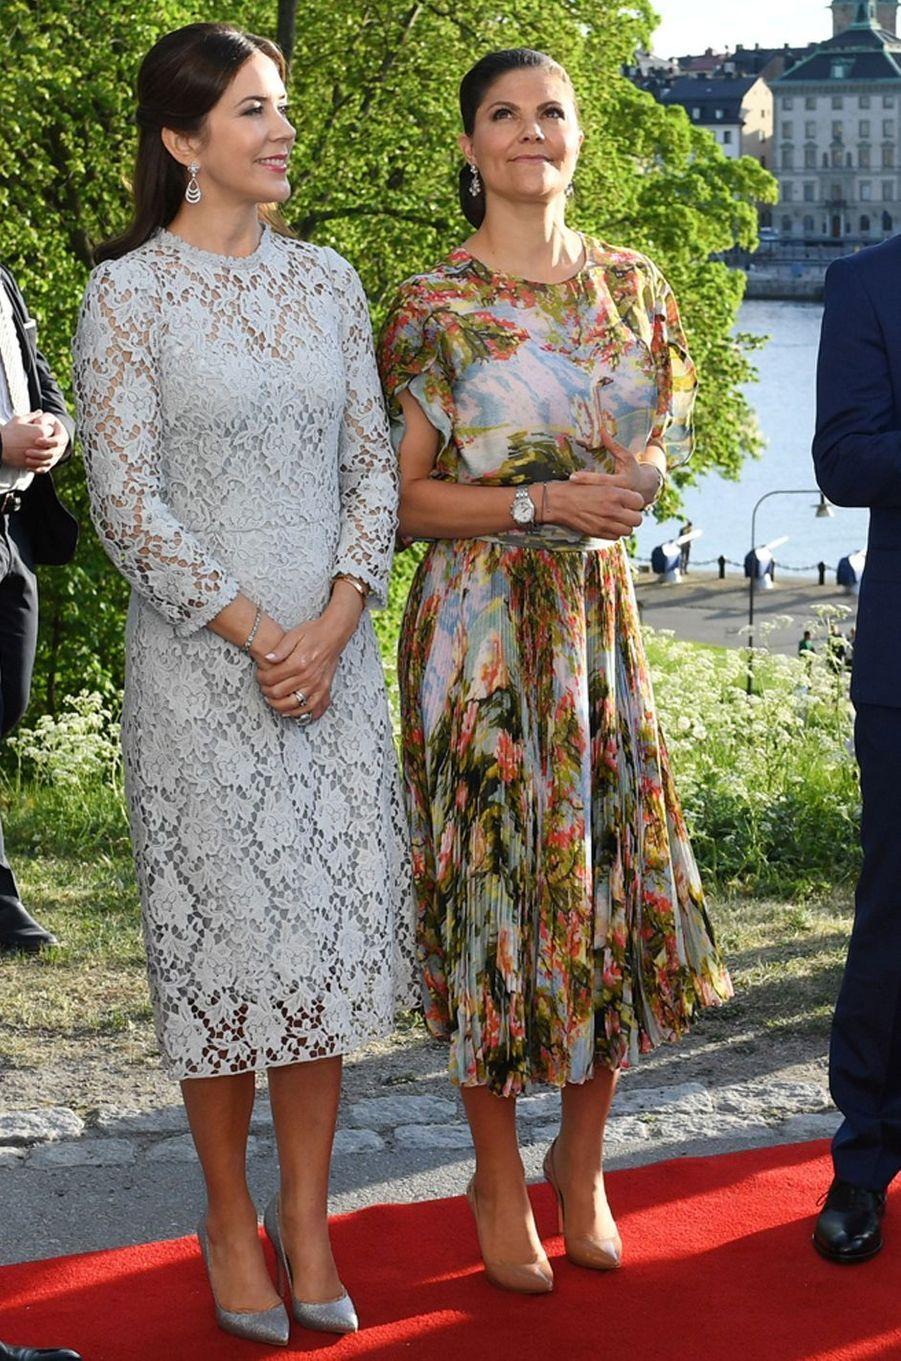 La princesse Victoria de Suède et la princesse Mary de Danemark le 29 mai 2017